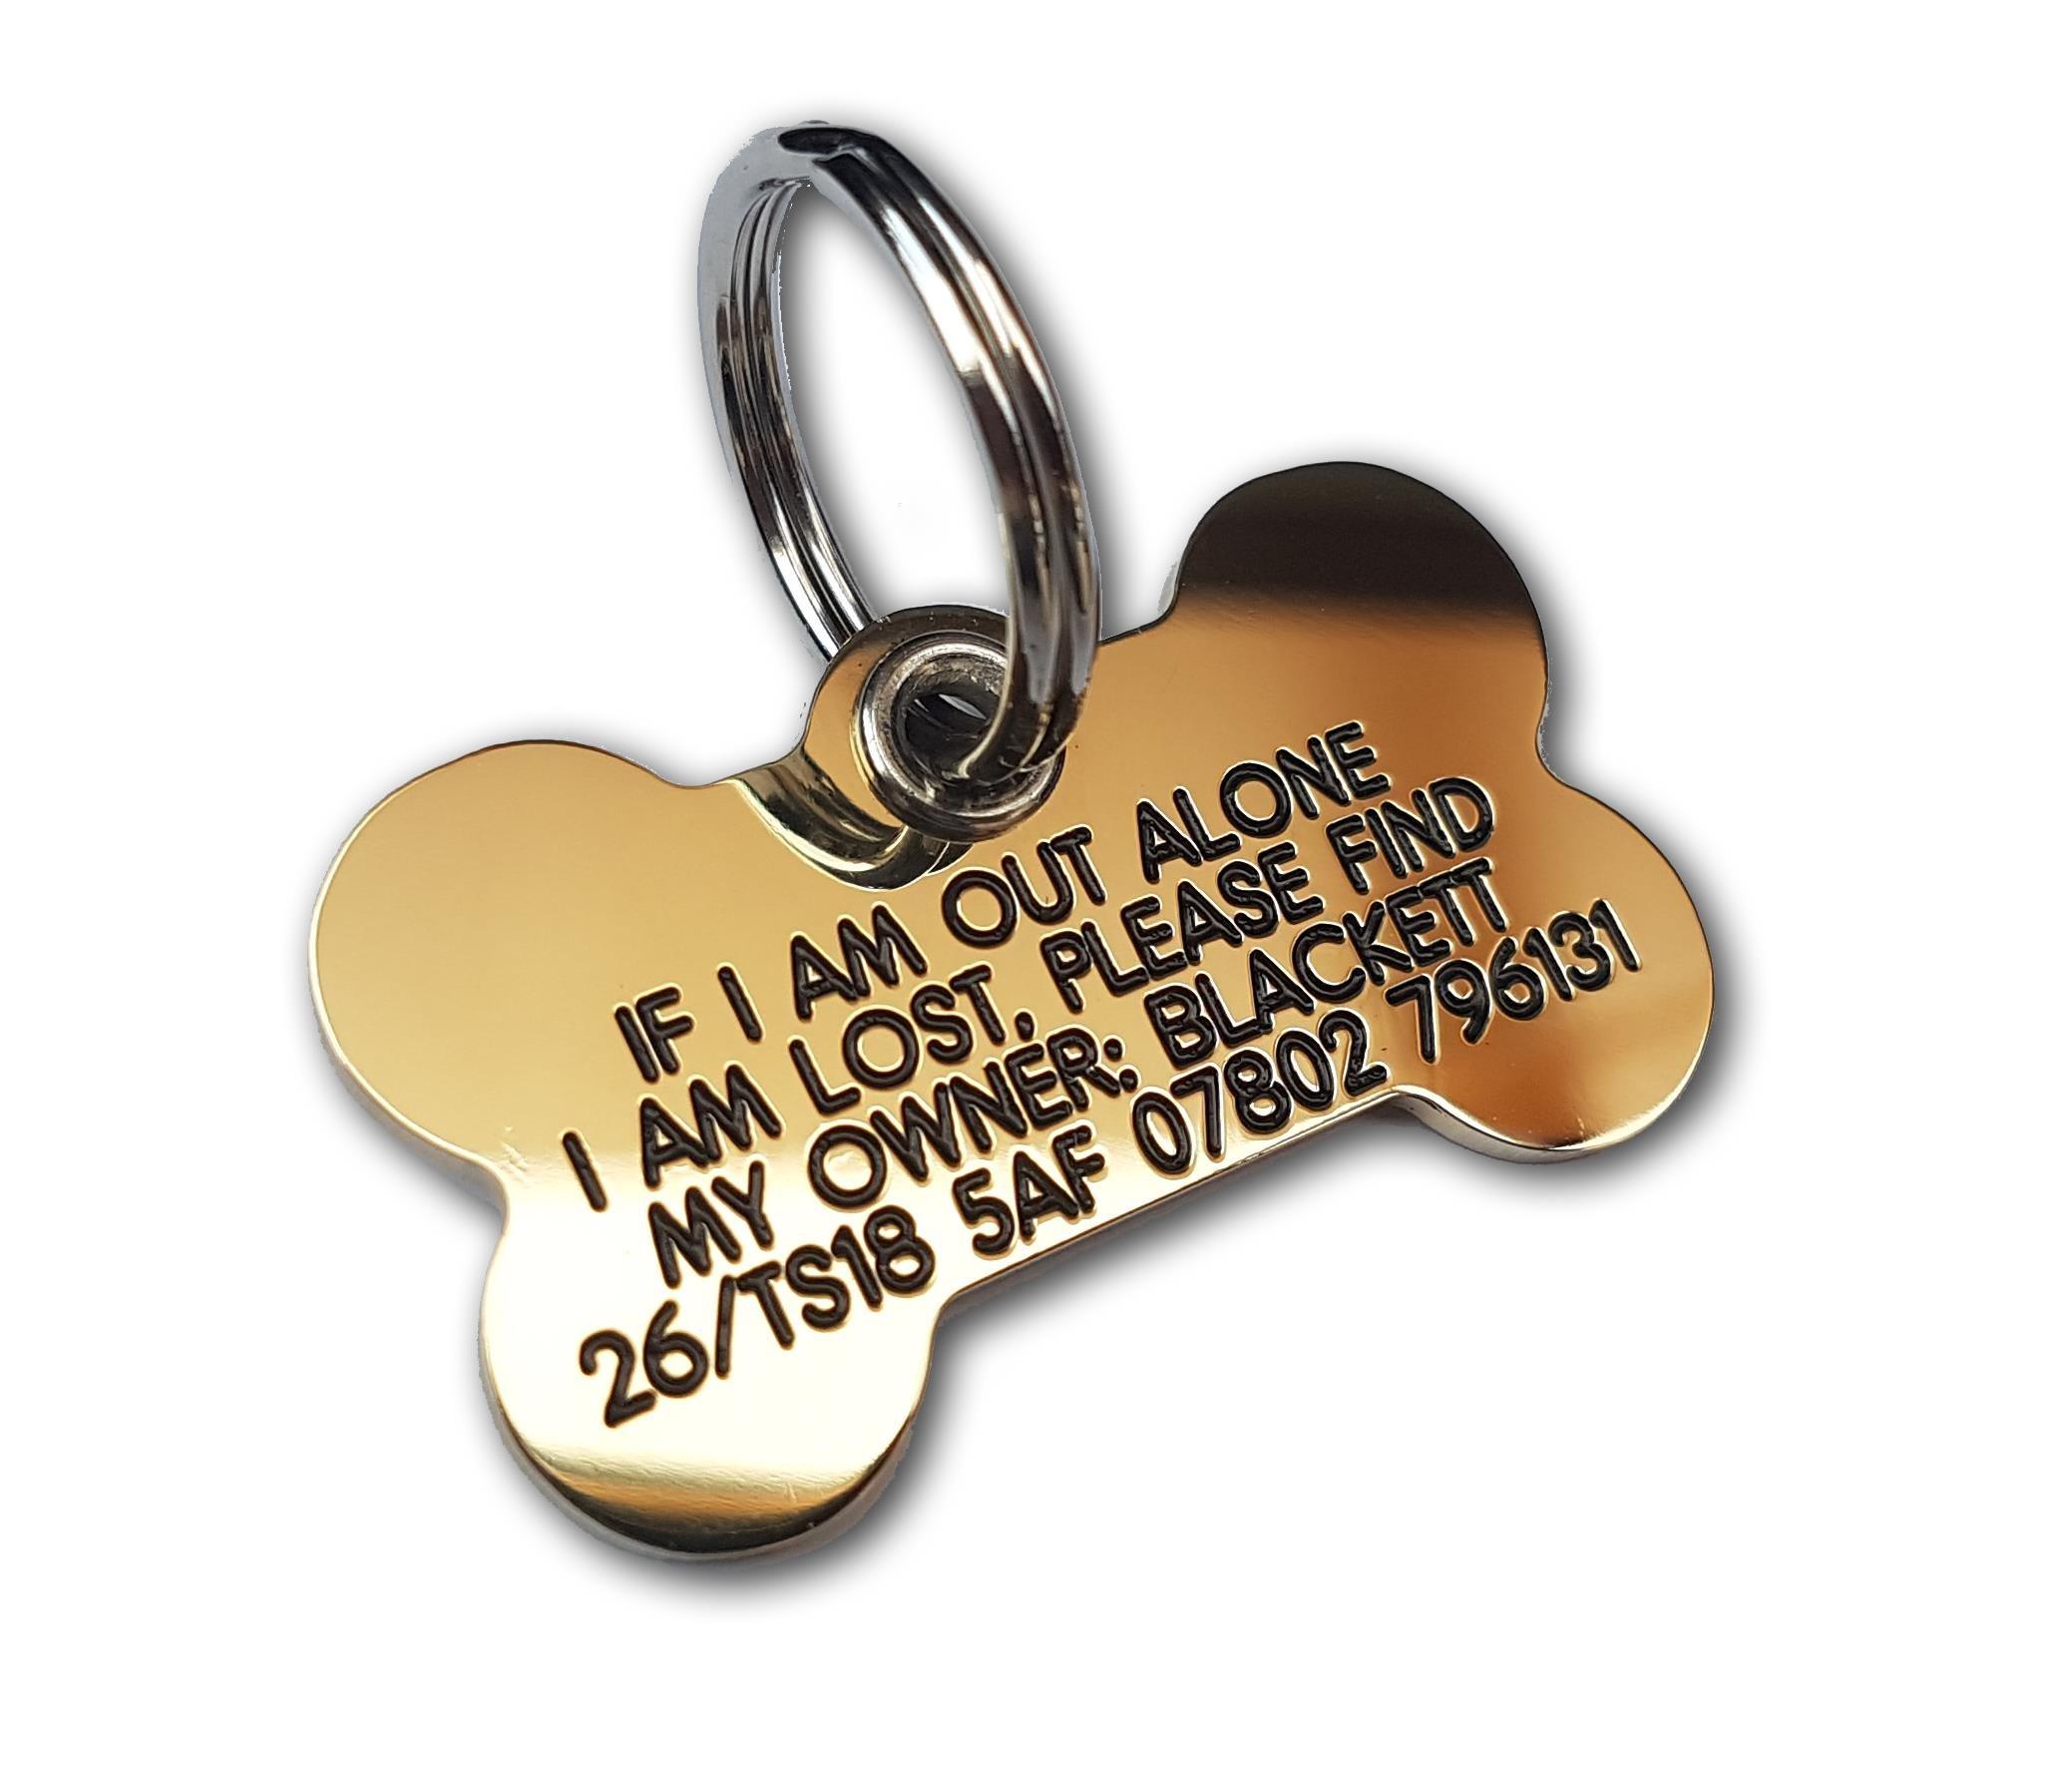 REINFORCED deeply engraved solid brass Bone dog tag